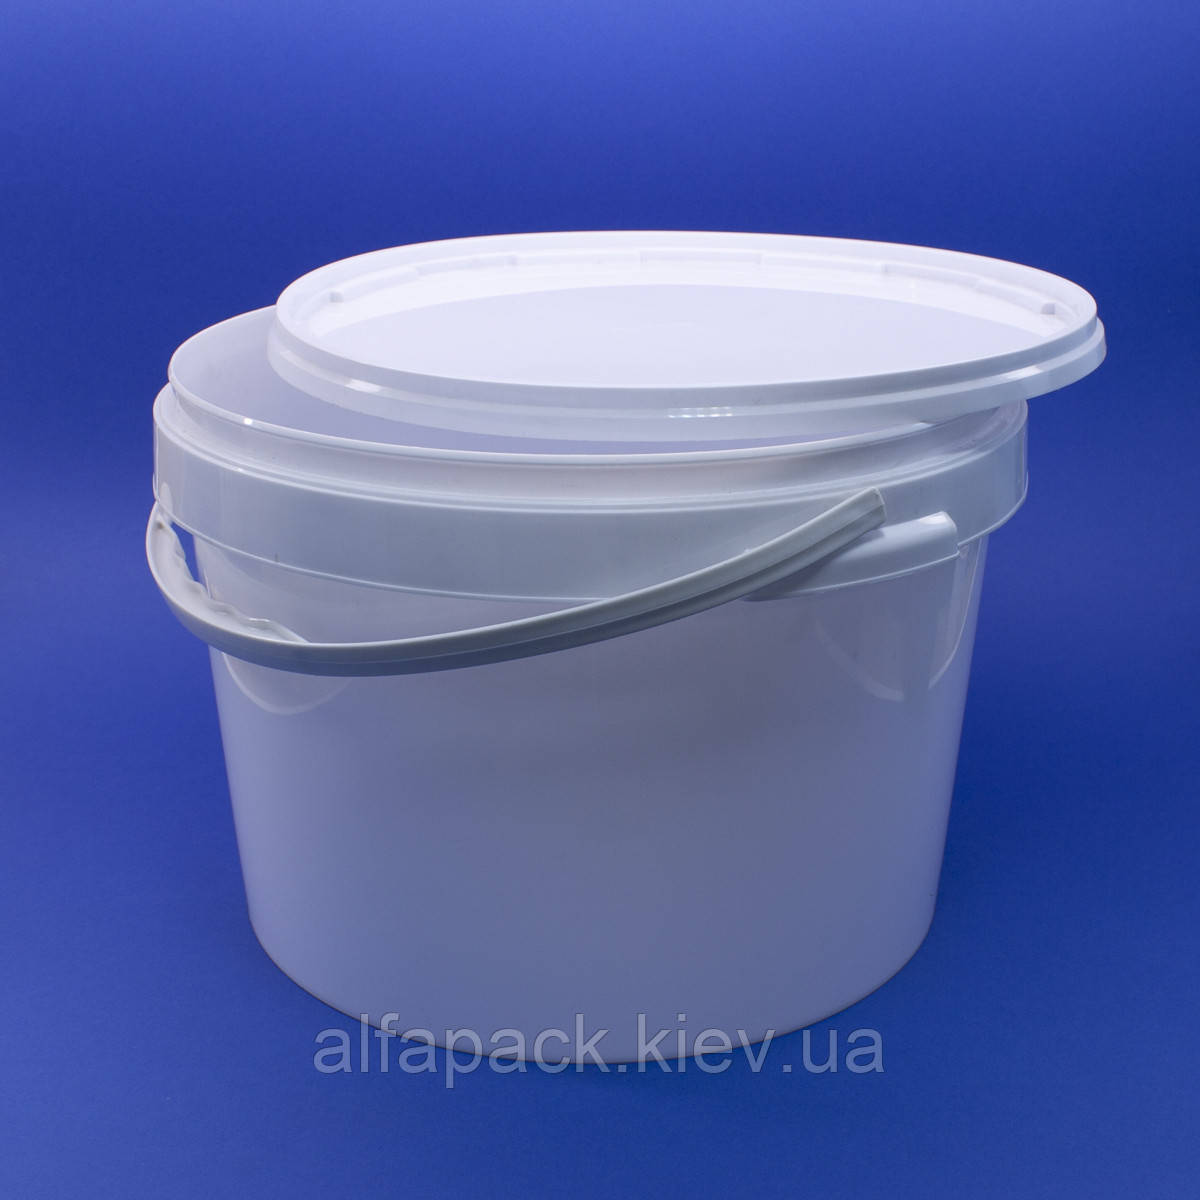 Ведро пластиковое белое 20 л